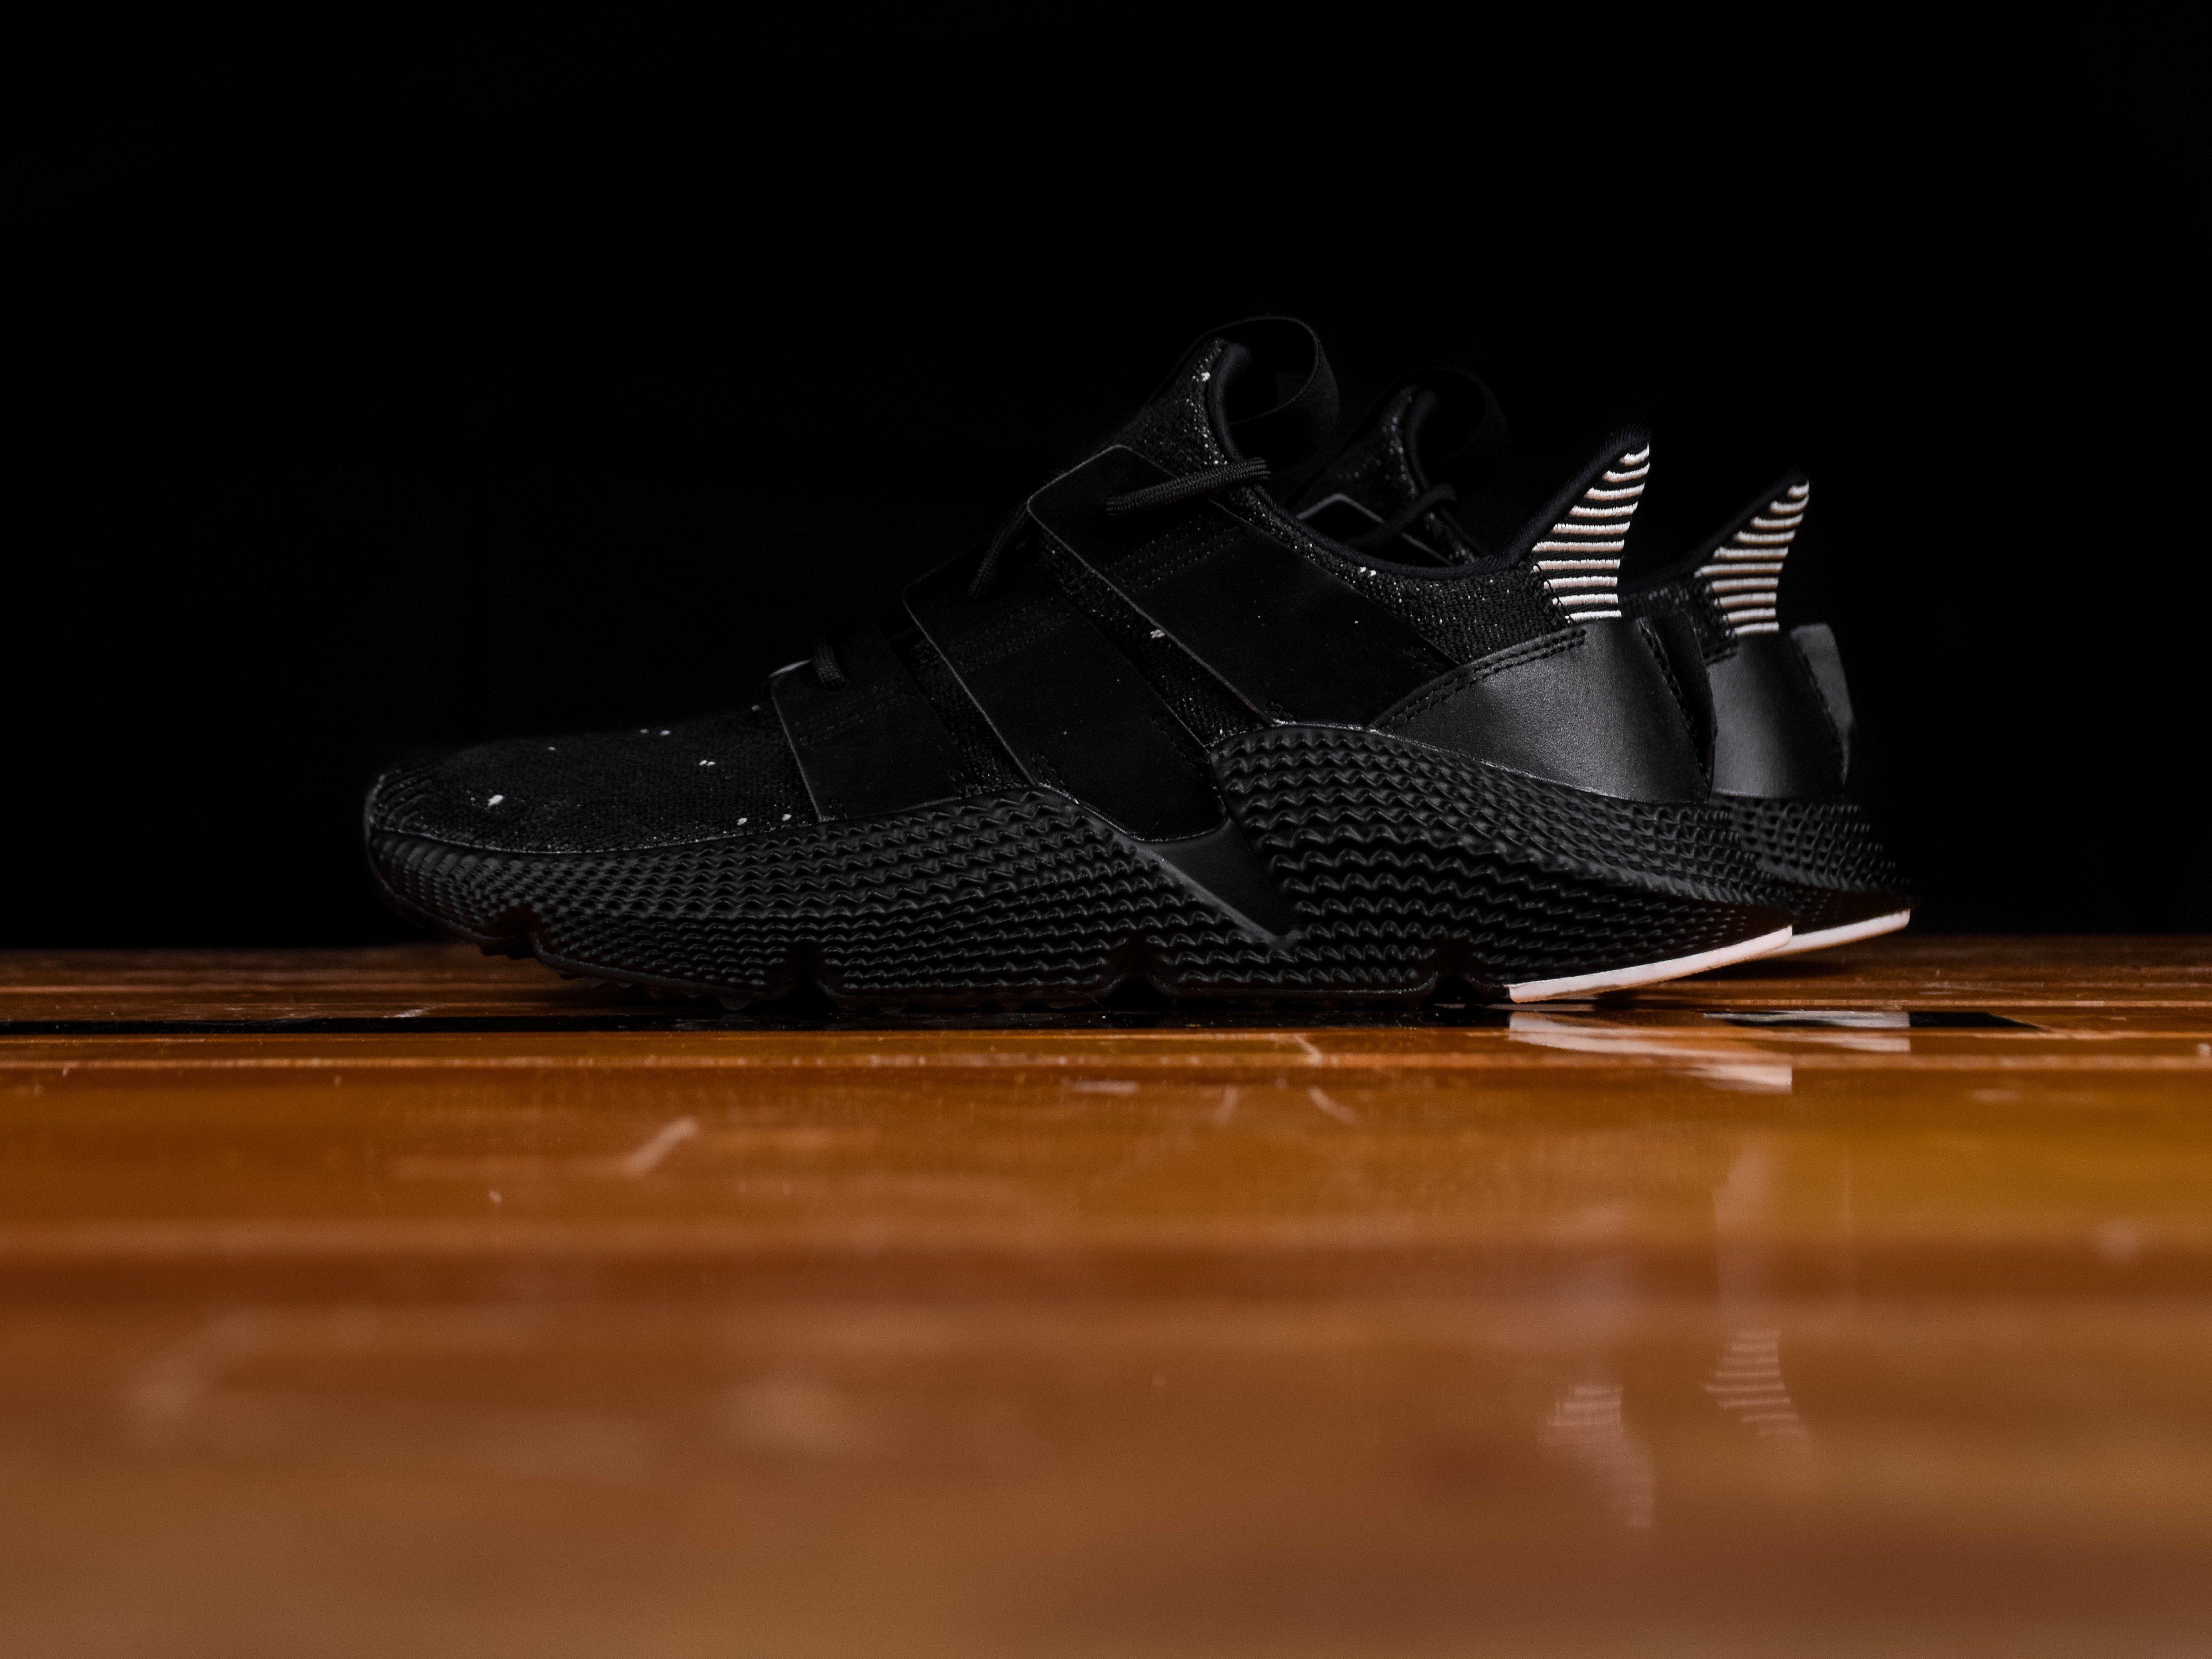 fantastic savings sneakers for whole family Men's Adidas Prophere [B22681] | Adidas | Adidas men, Adidas ...